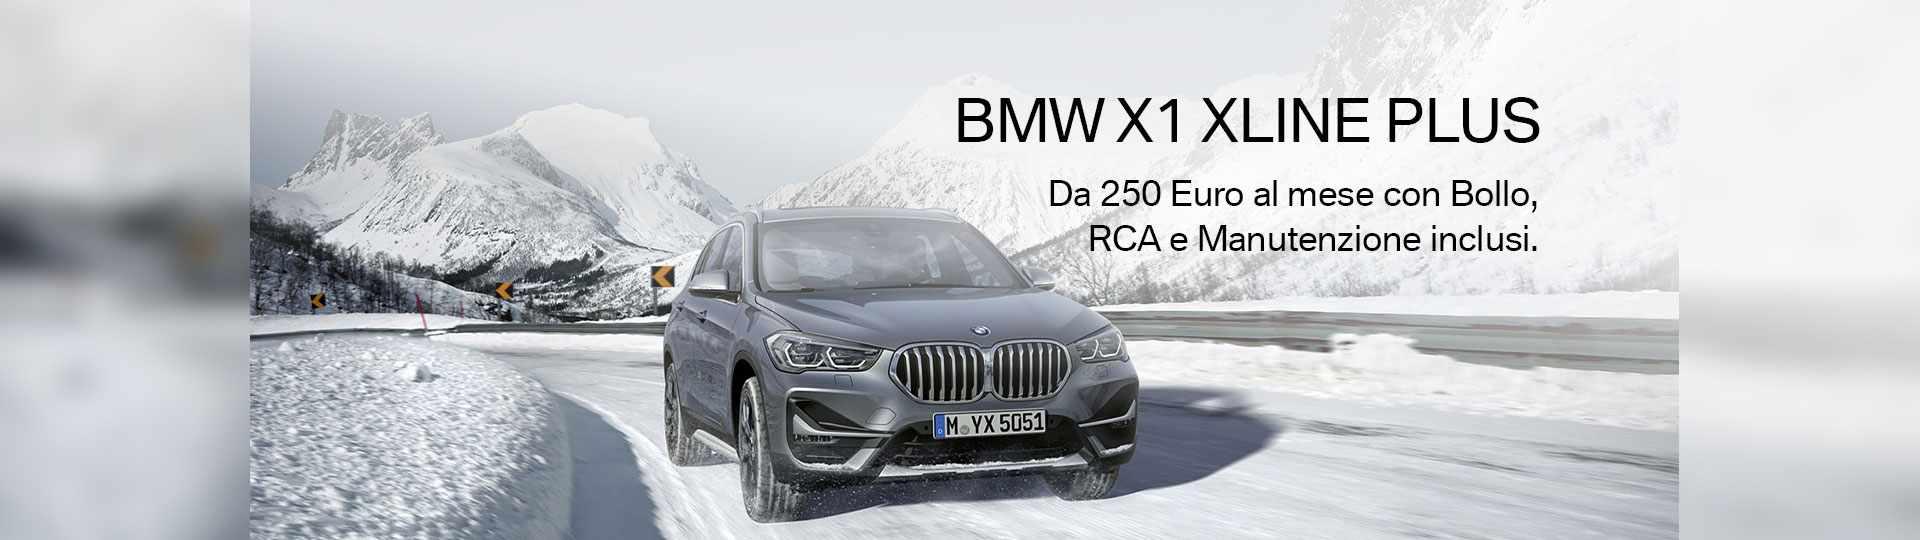 BMW-X1-XLine-Plus_gennaio-2021-min.jpg